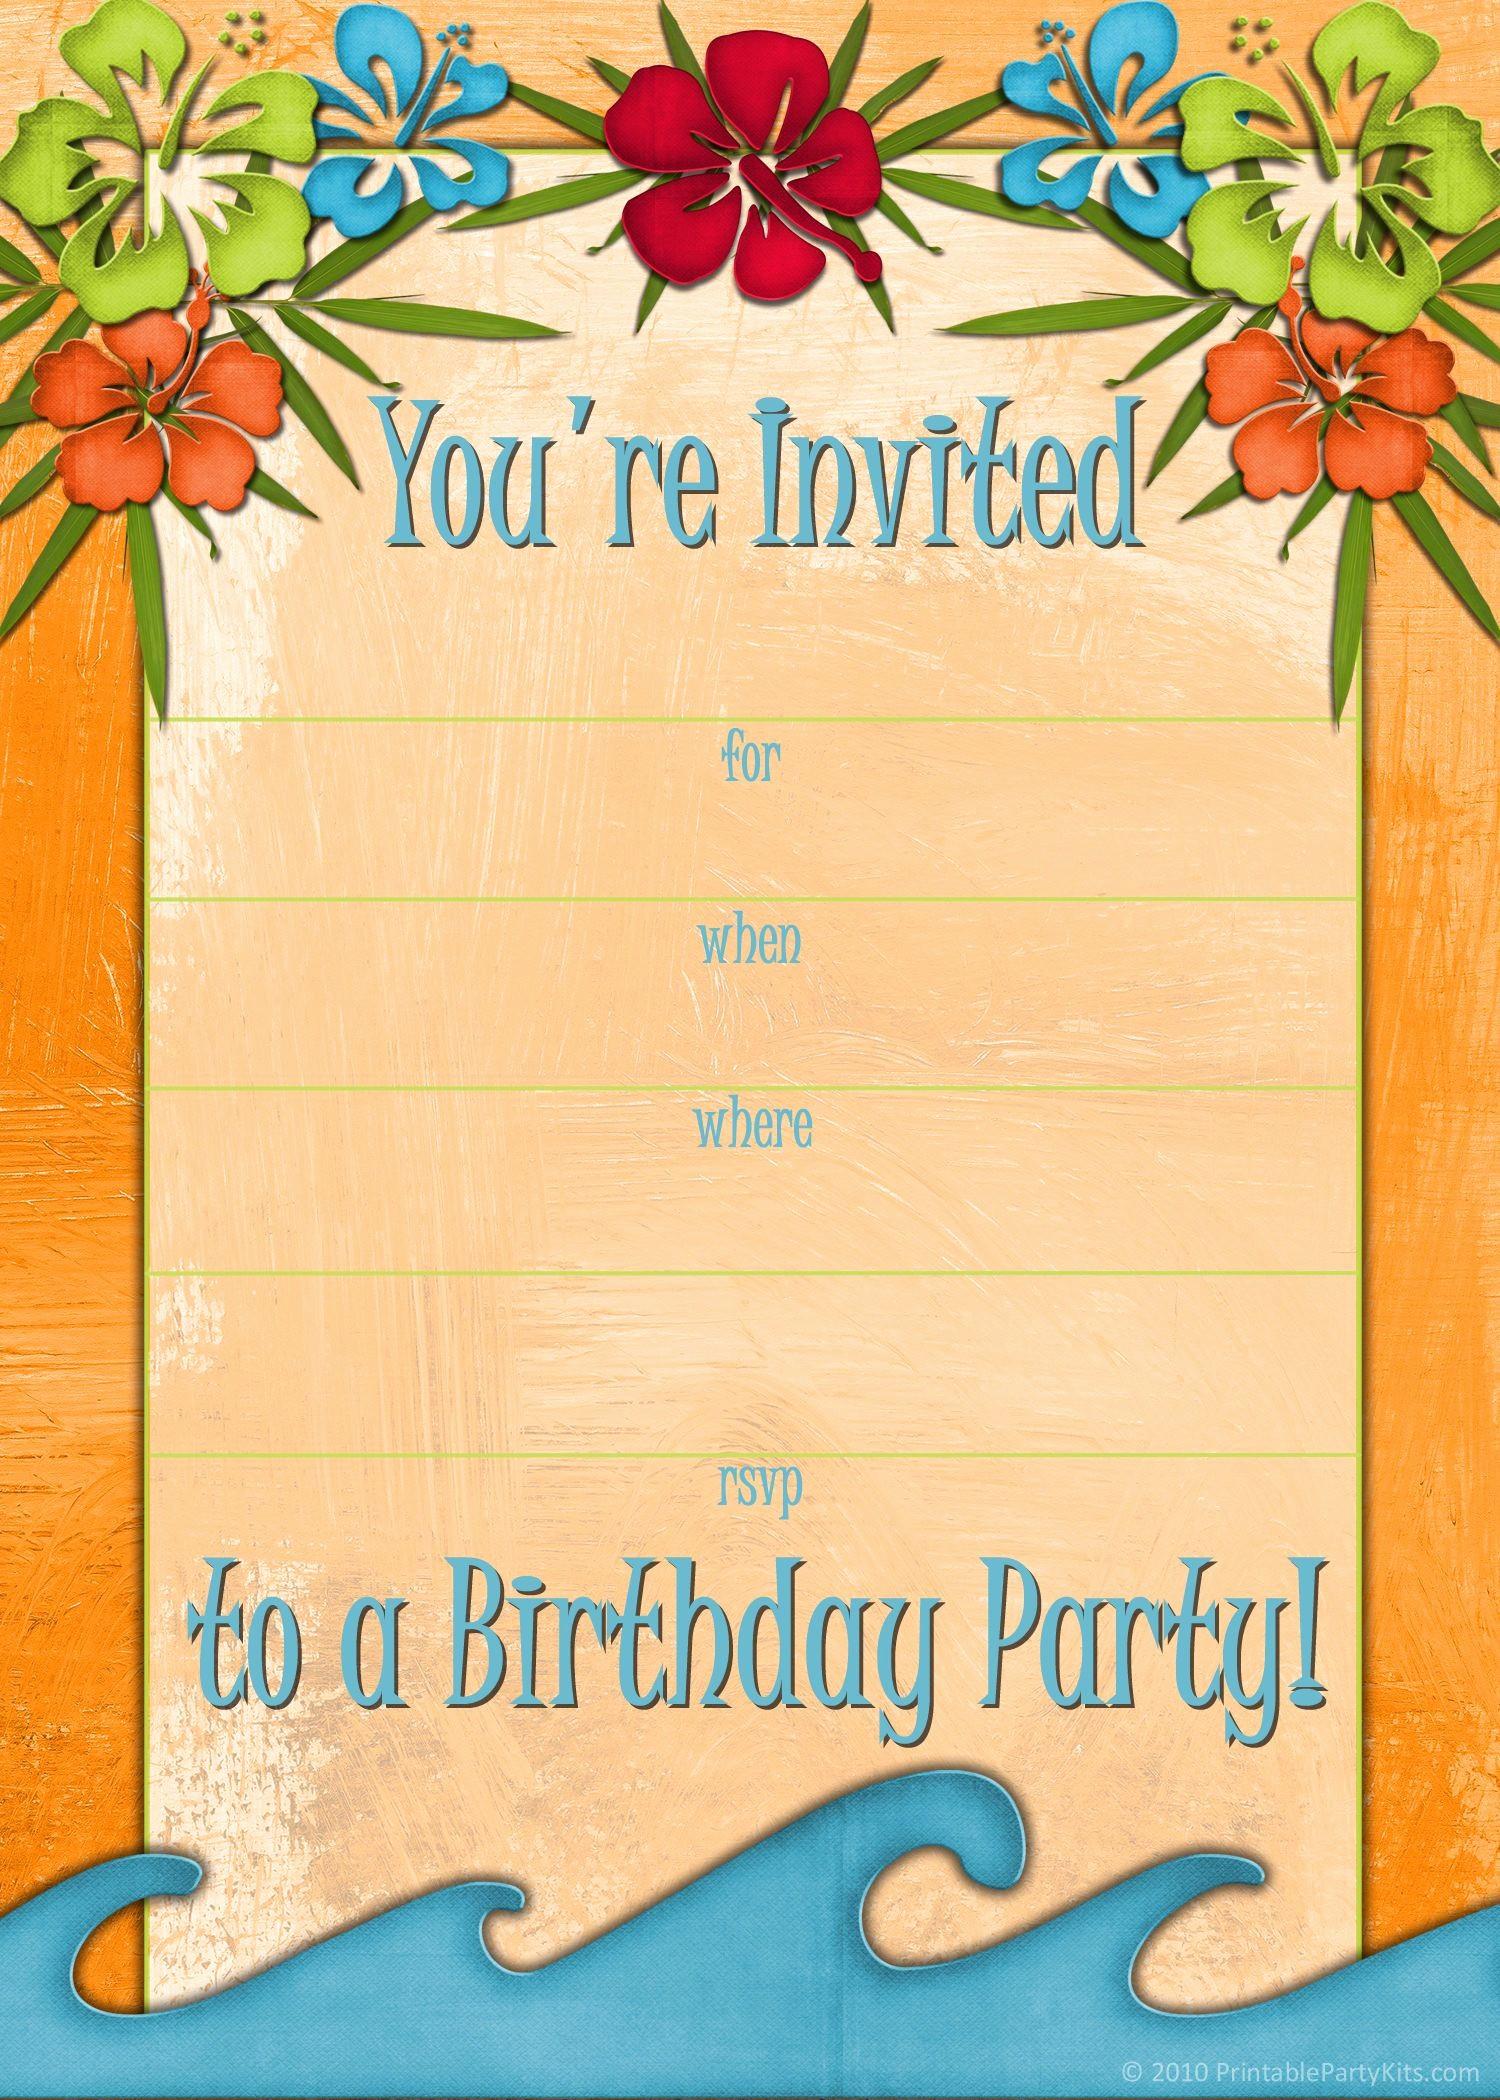 Hawaiian theme Party Invitations Printable Luxury Free Printable Beach Party Luau and Bbq Invitations